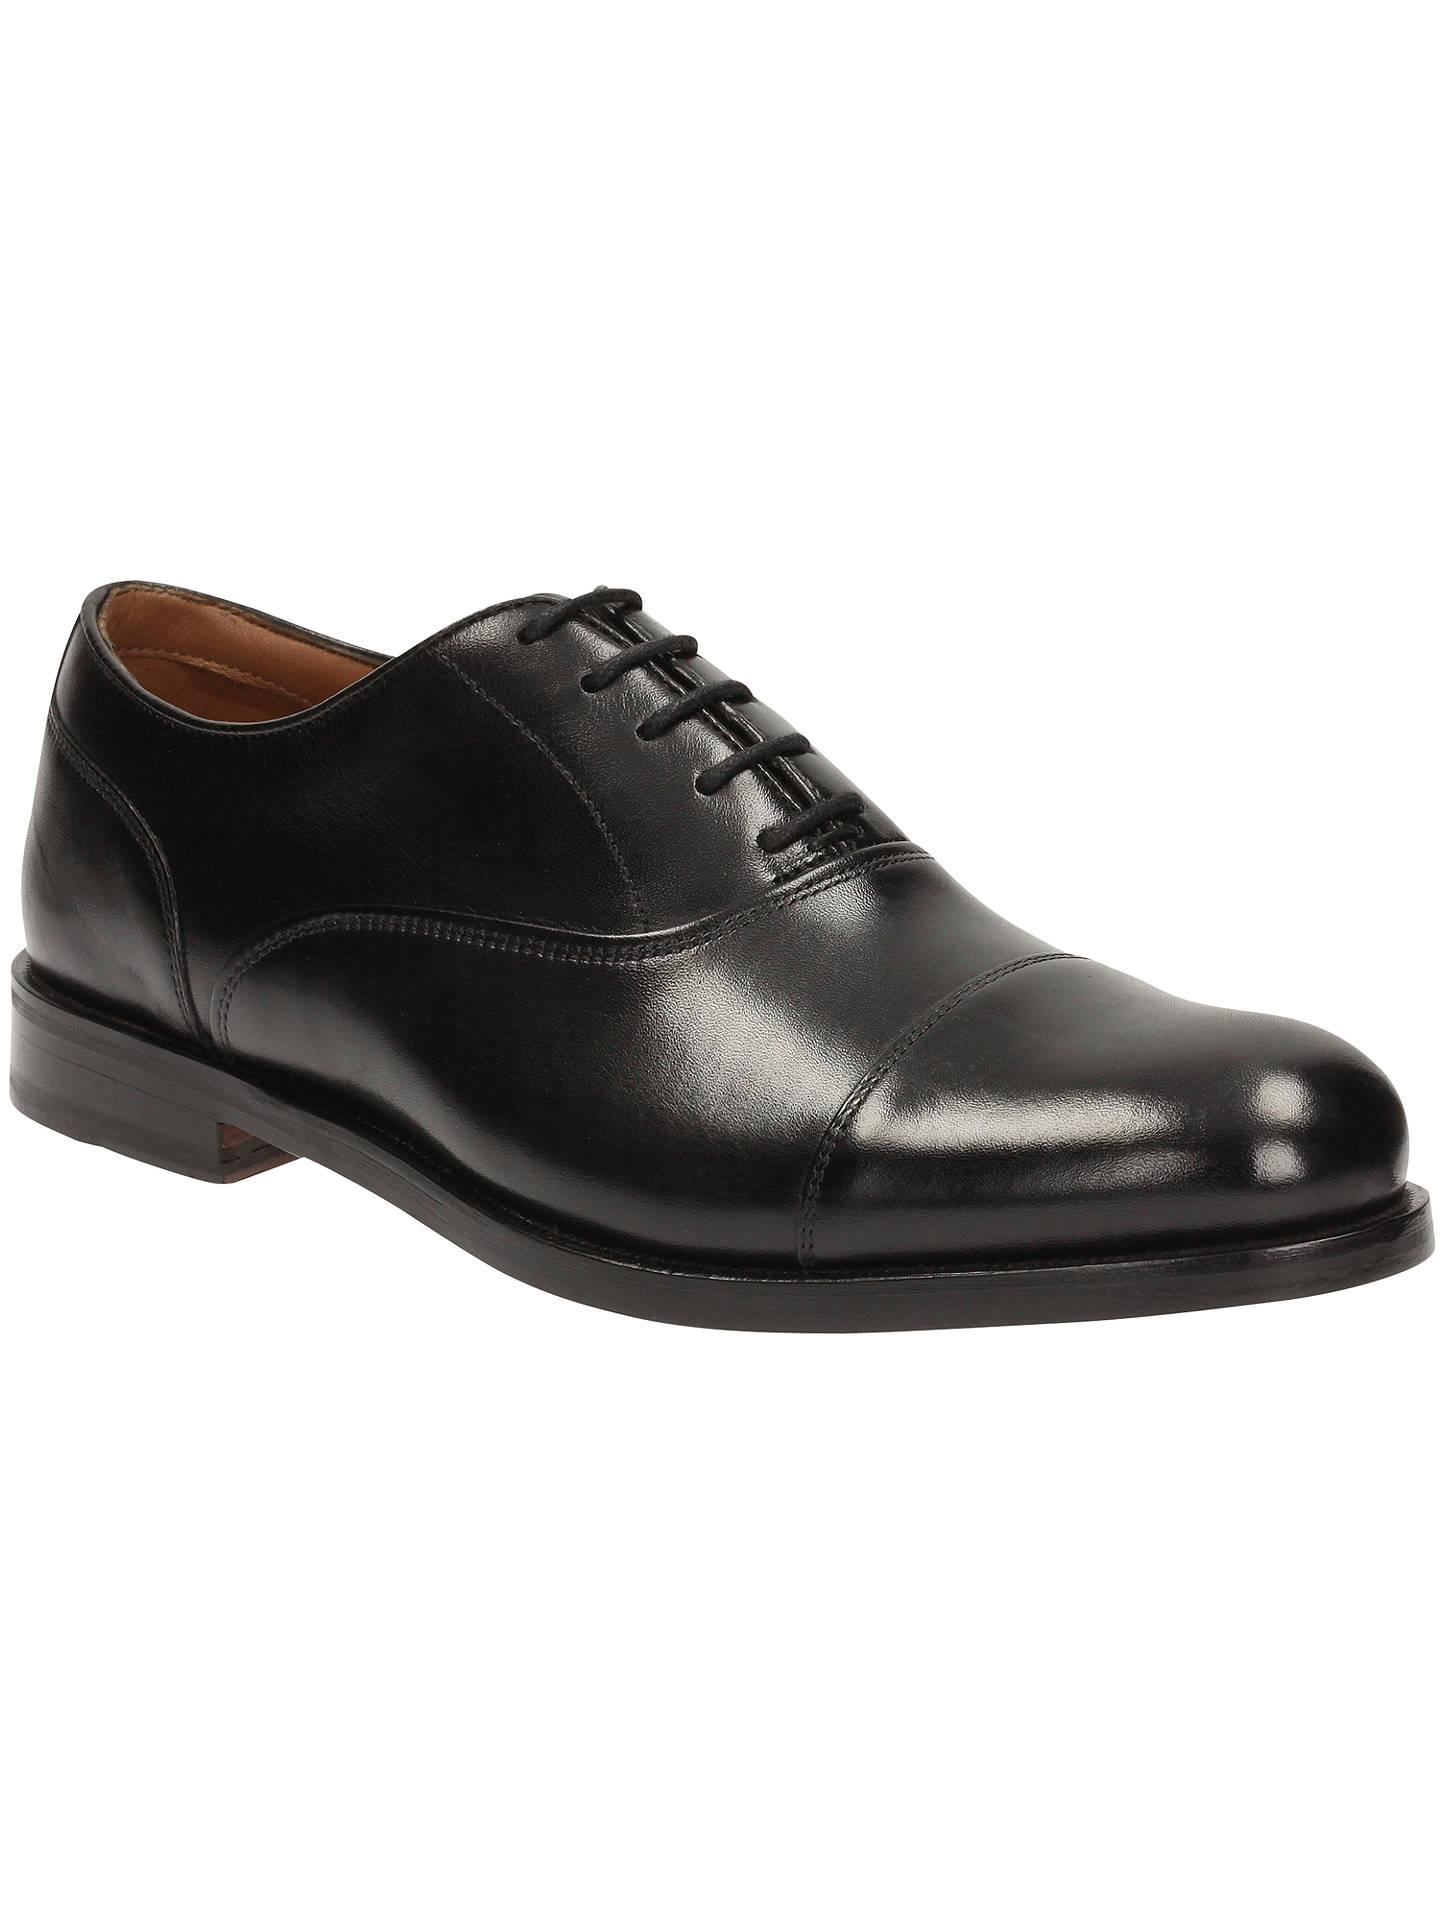 6cd2f6ed Clark Coling Boss Oxford Shoe, Black at John Lewis & Partners